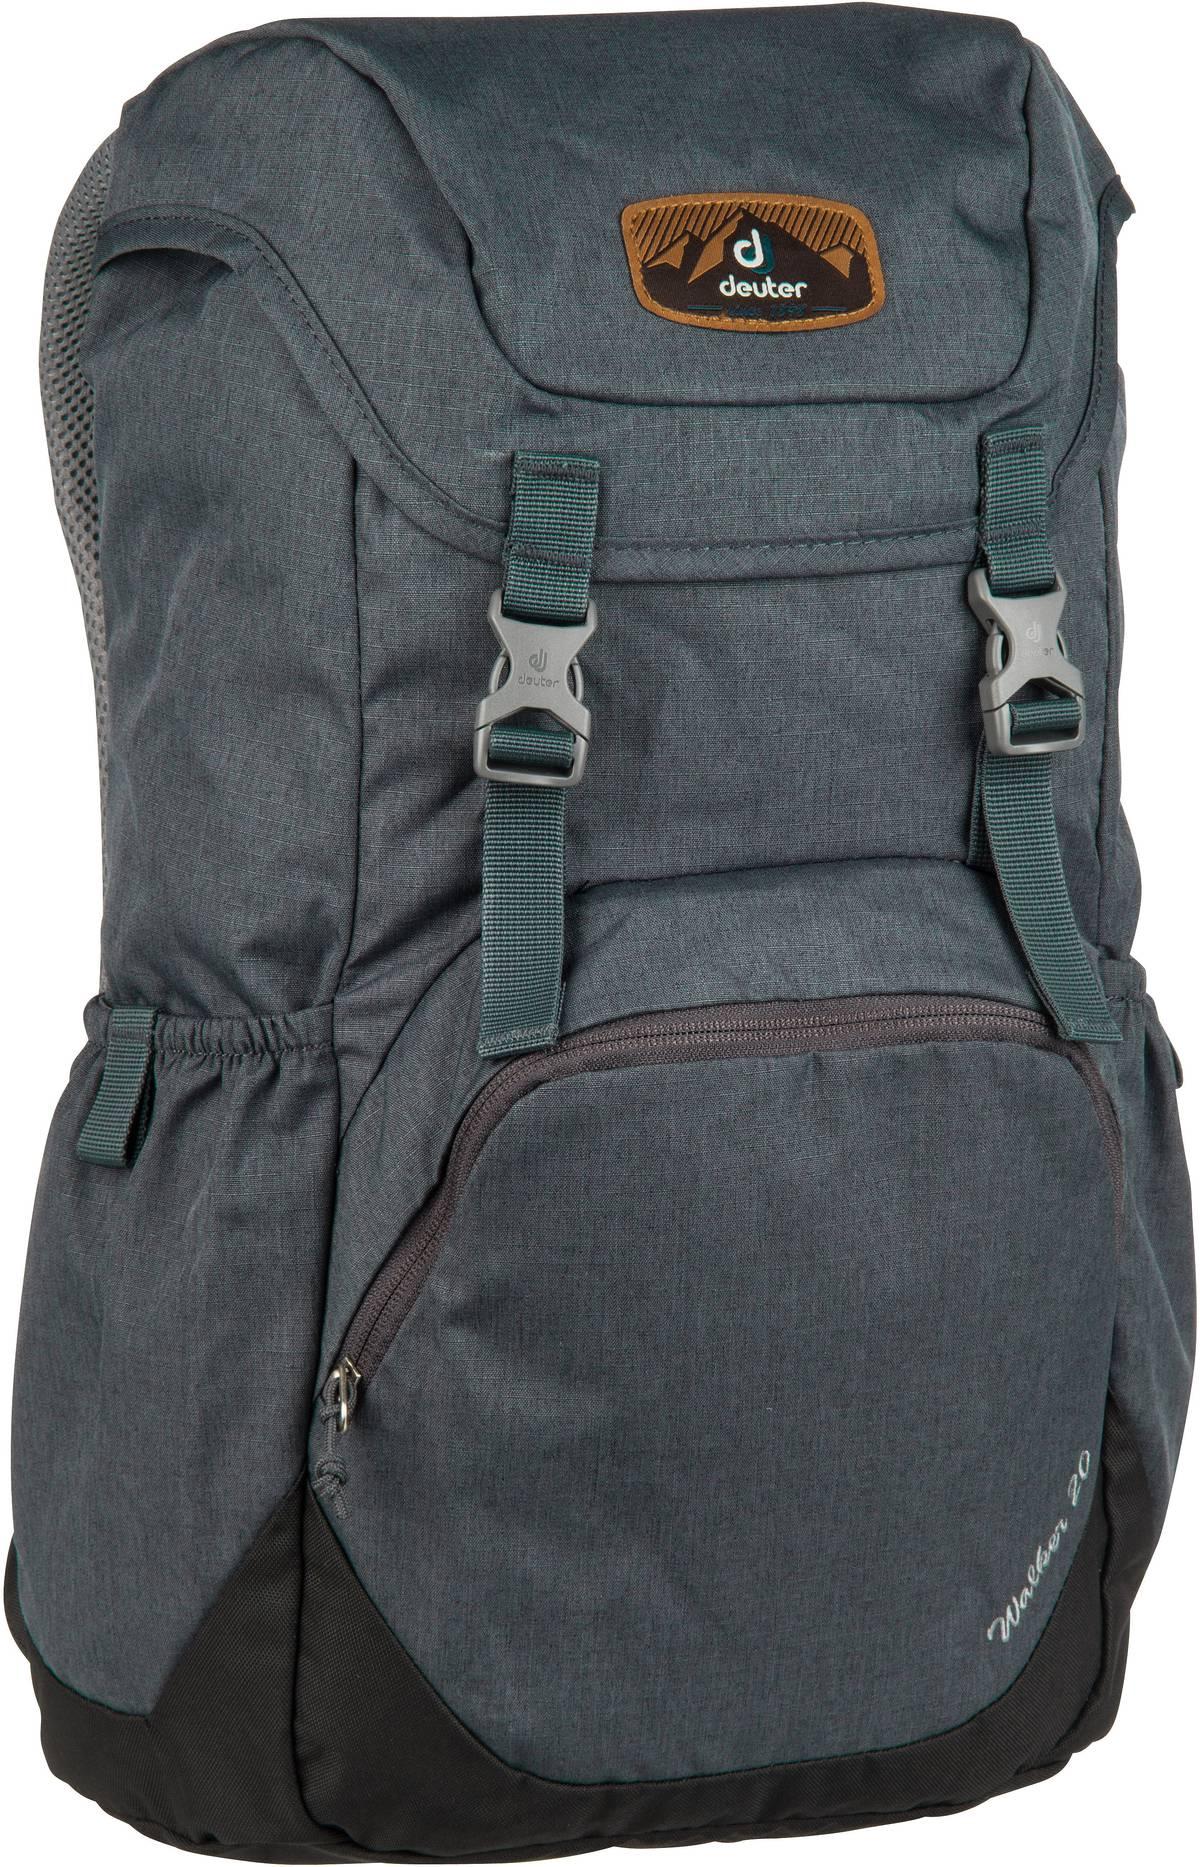 Rucksack / Daypack Walker 20 Graphite/Black (20 Liter)